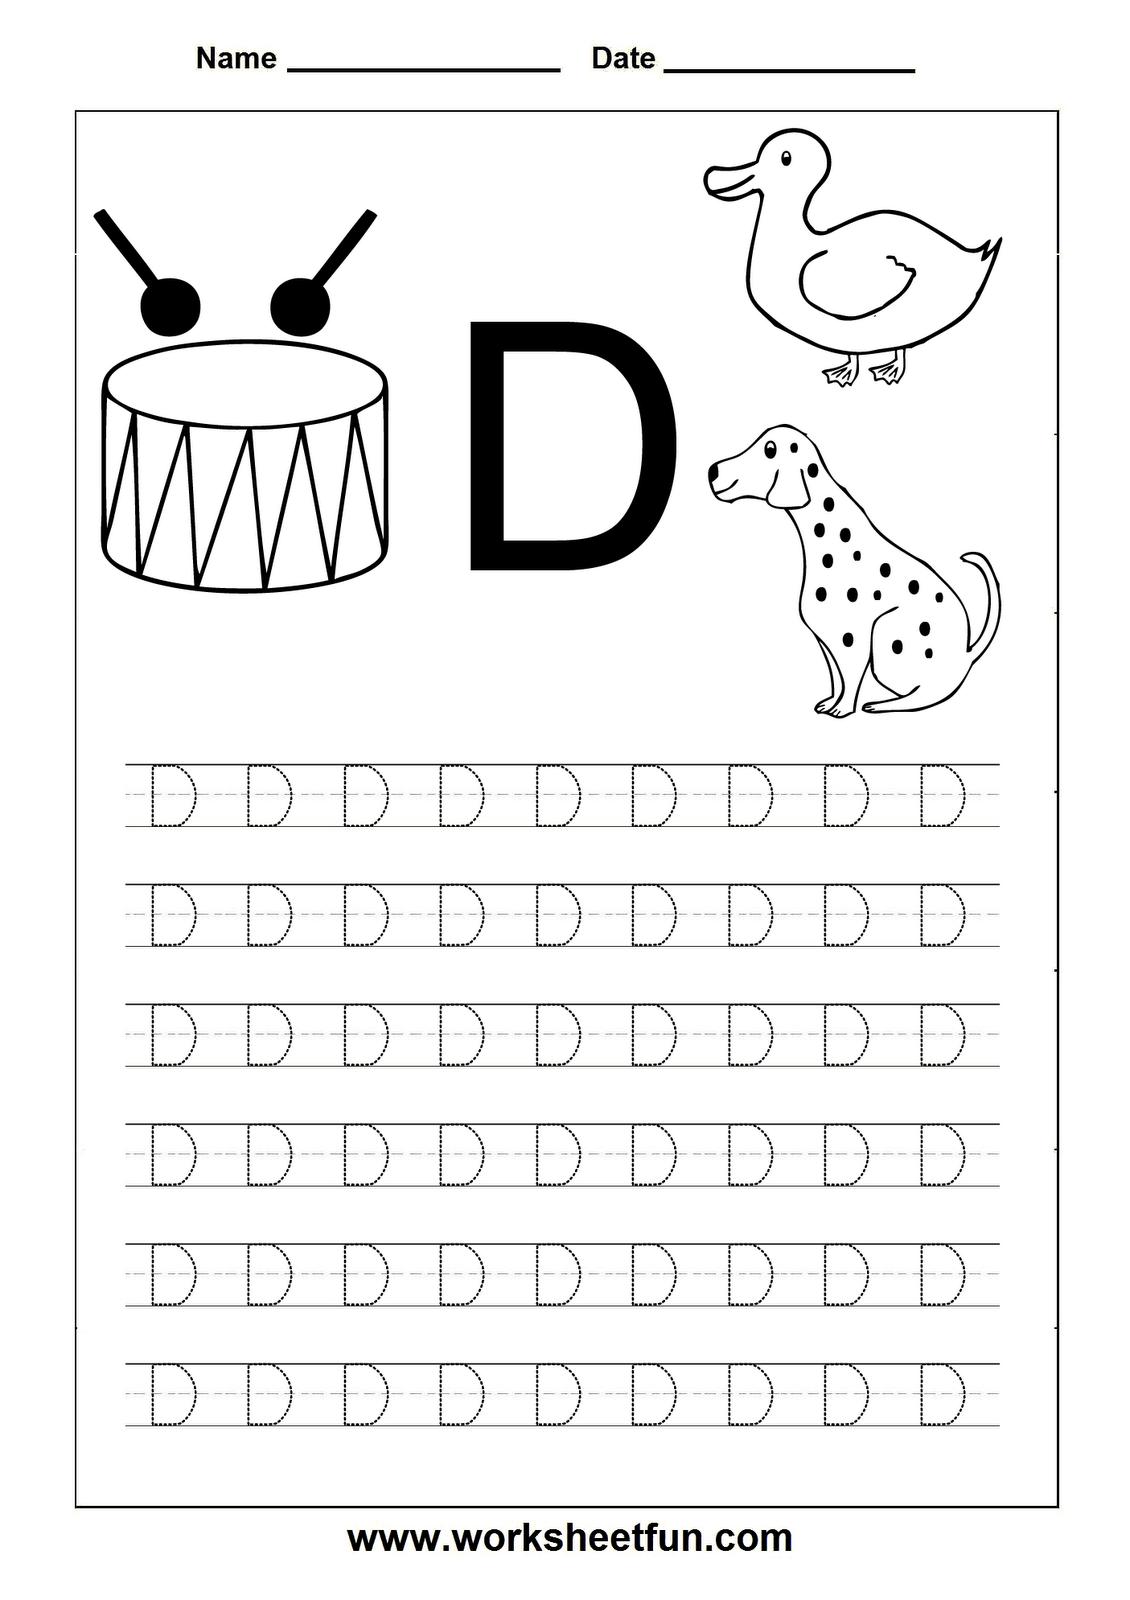 Letter D Worksheets Hd Wallpapers Download Free Letter D throughout Alphabet Worksheets Pinterest